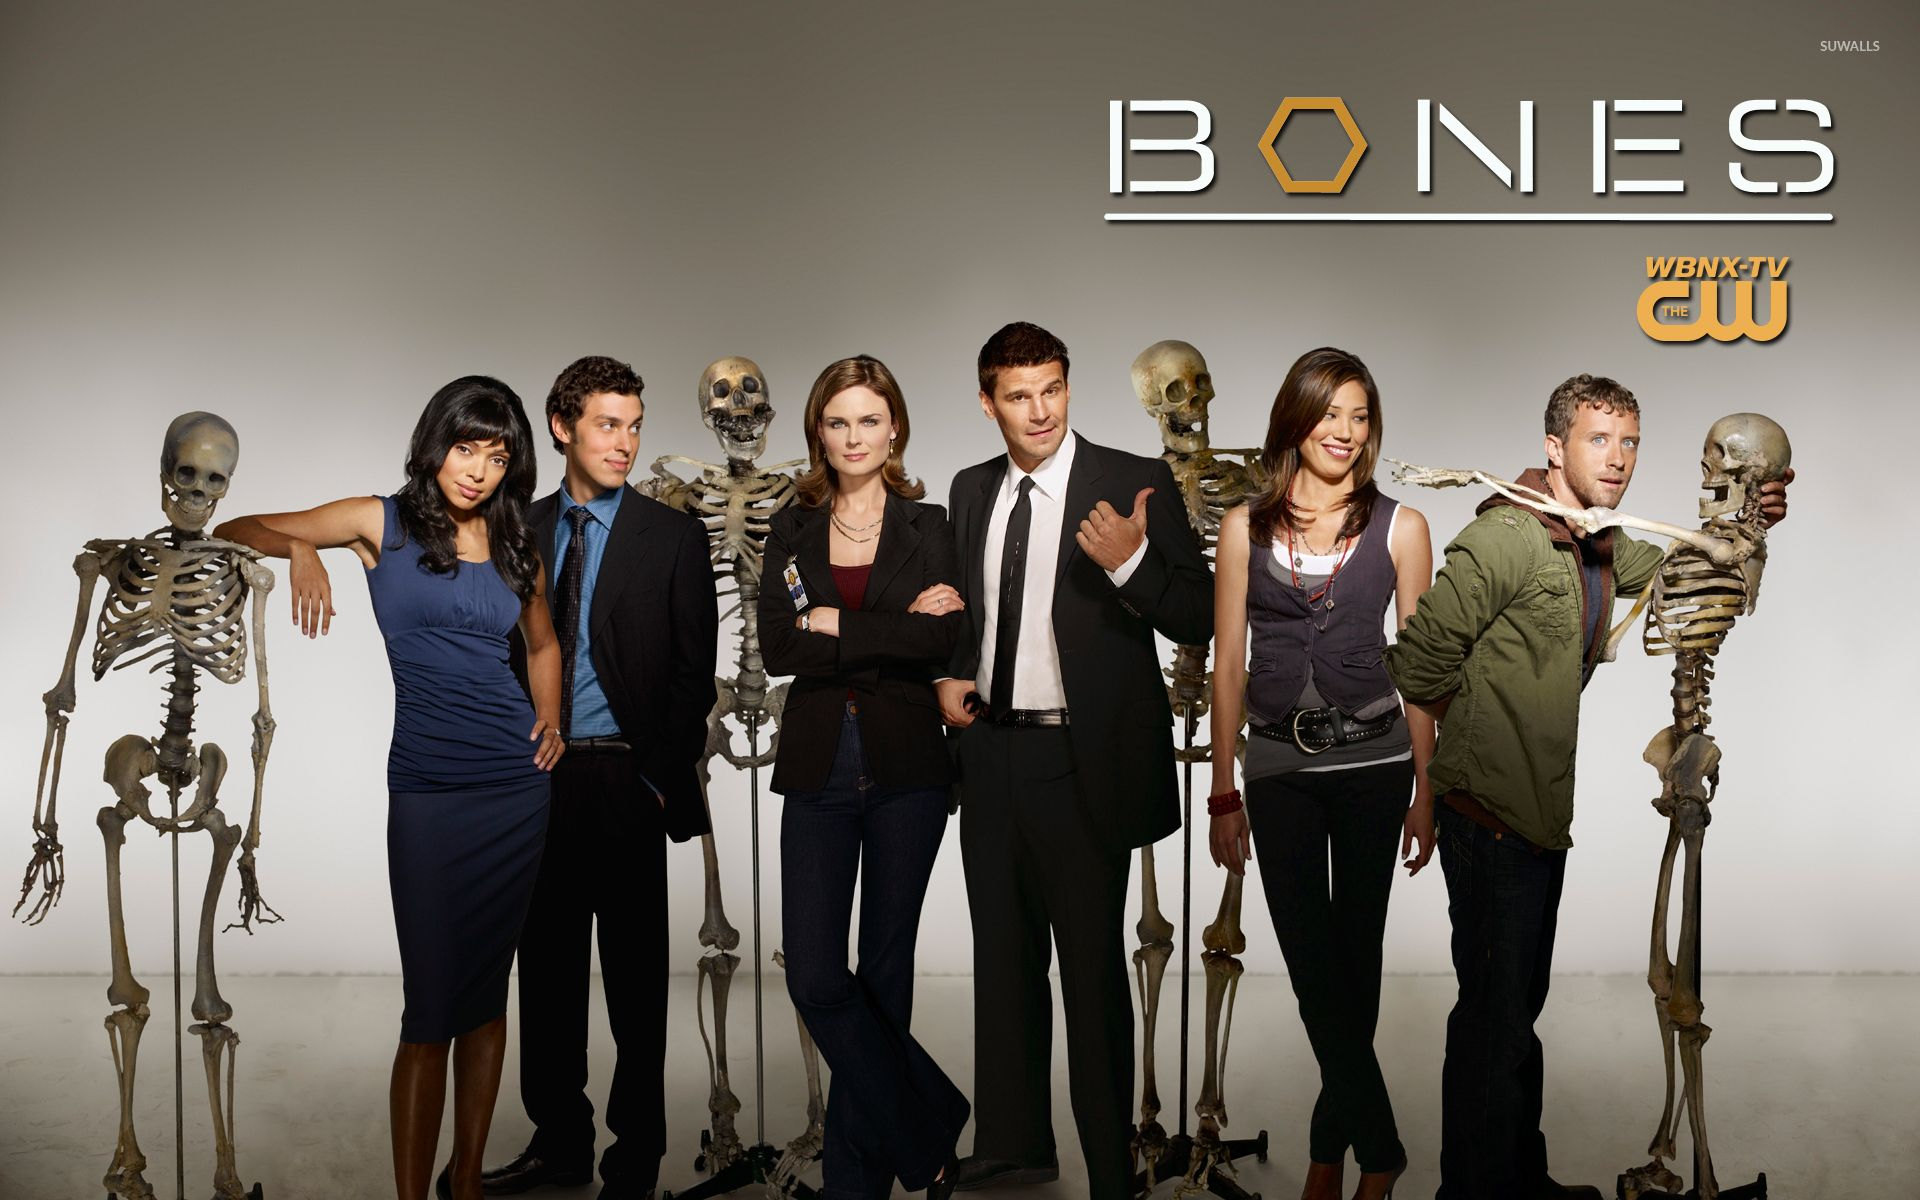 Bones Tv Show Logo Wallpapers Top Free Bones Tv Show Logo Backgrounds Wallpaperaccess